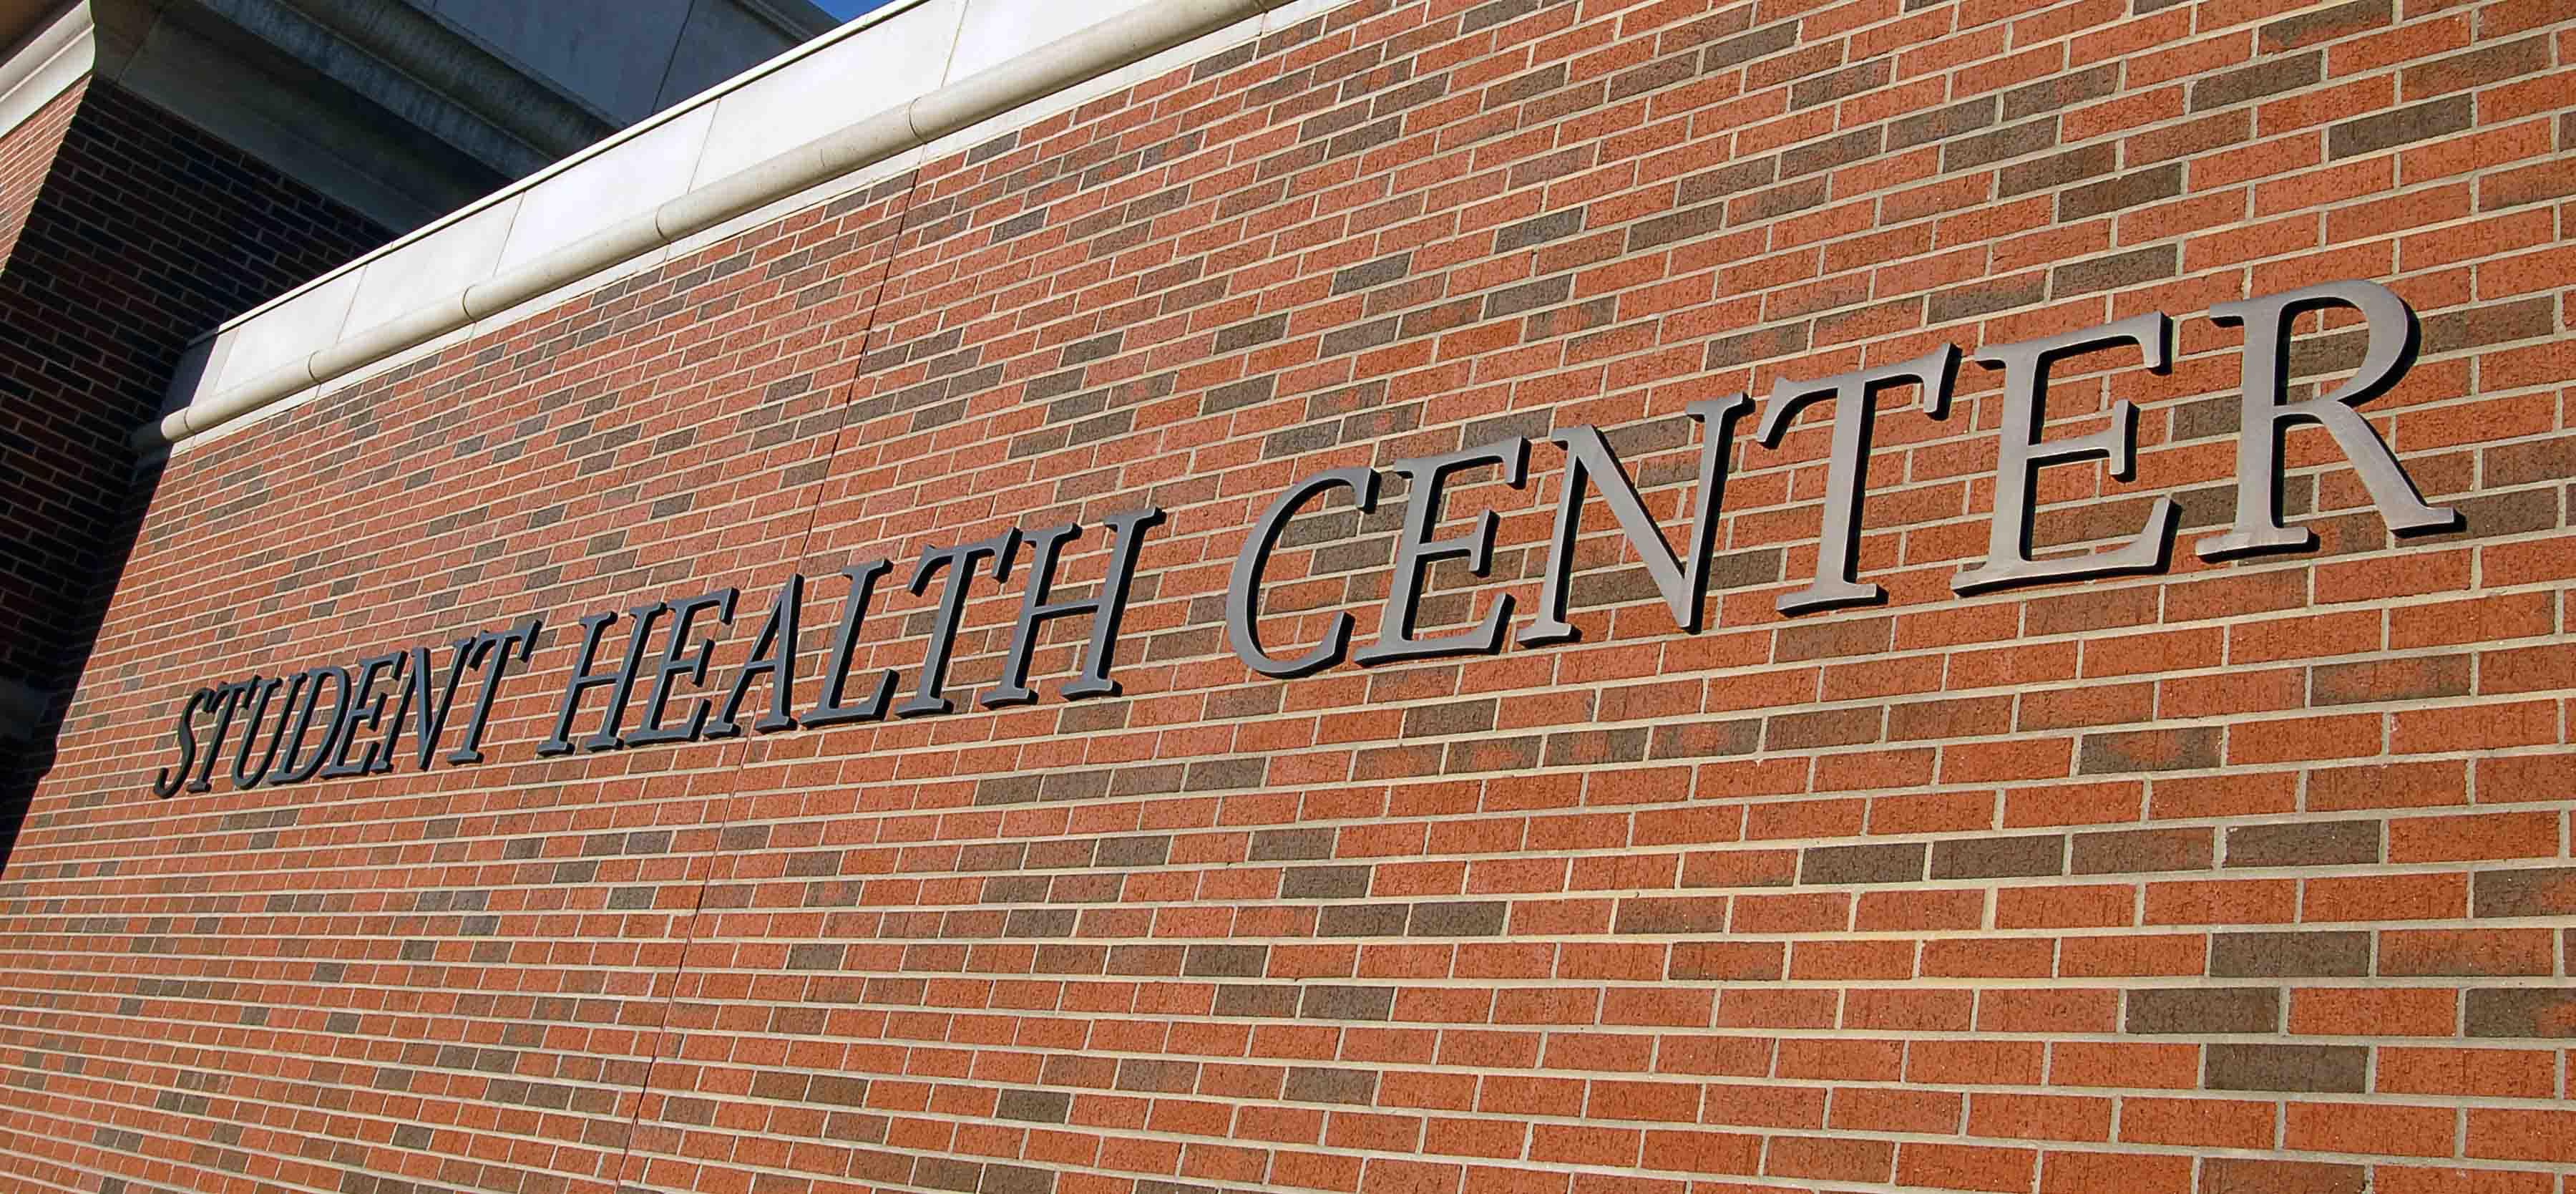 Student health center sign